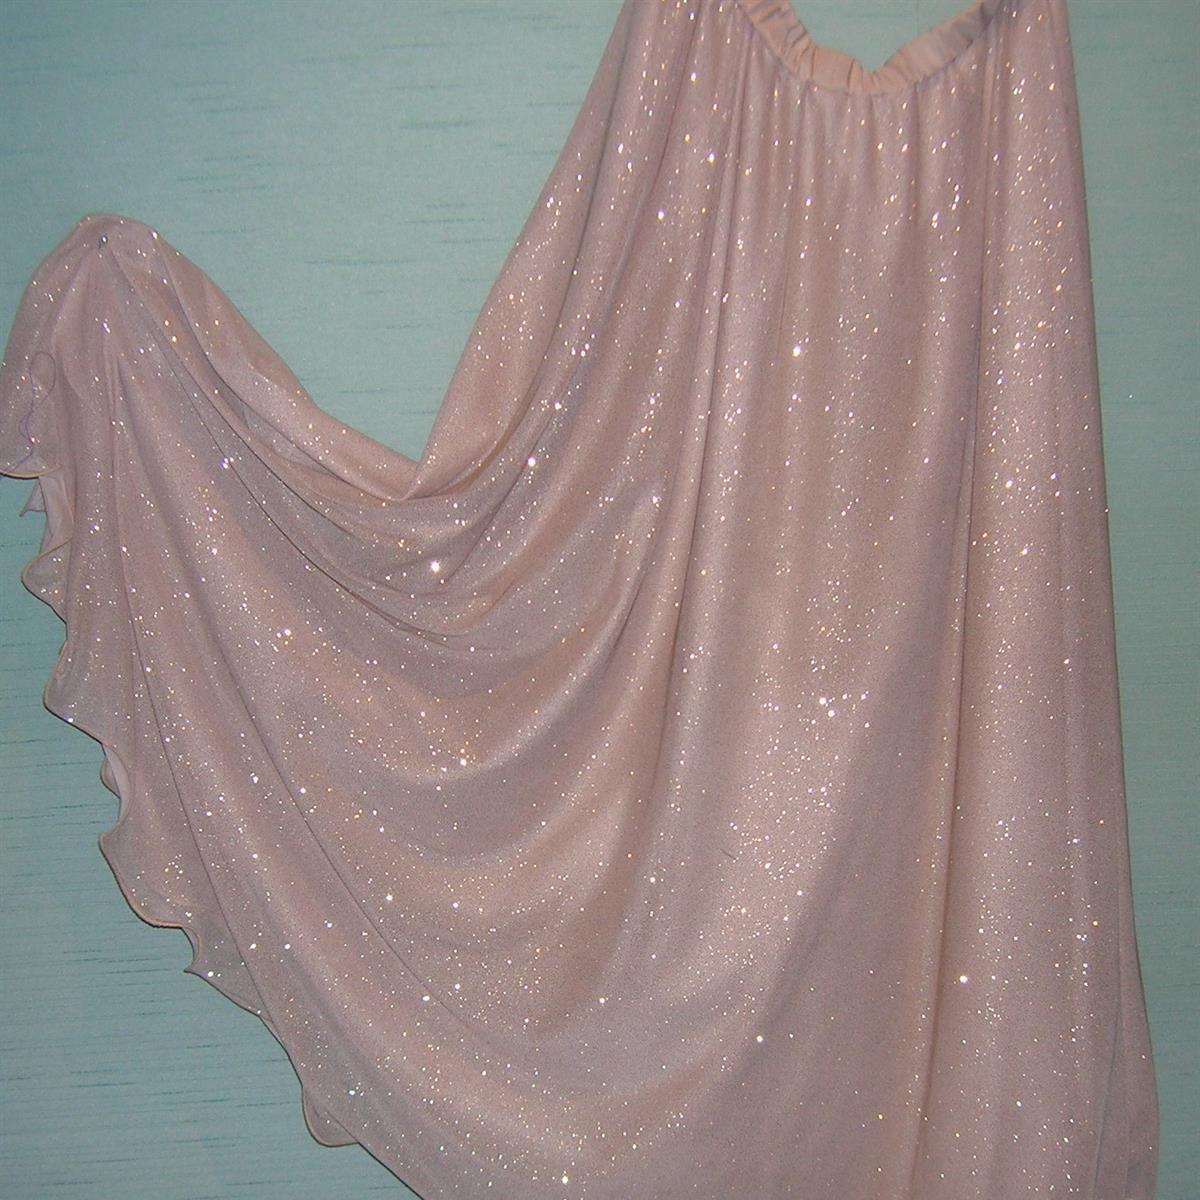 White/Silver Sparkle Chiffon 1/2 circle flounce skirt